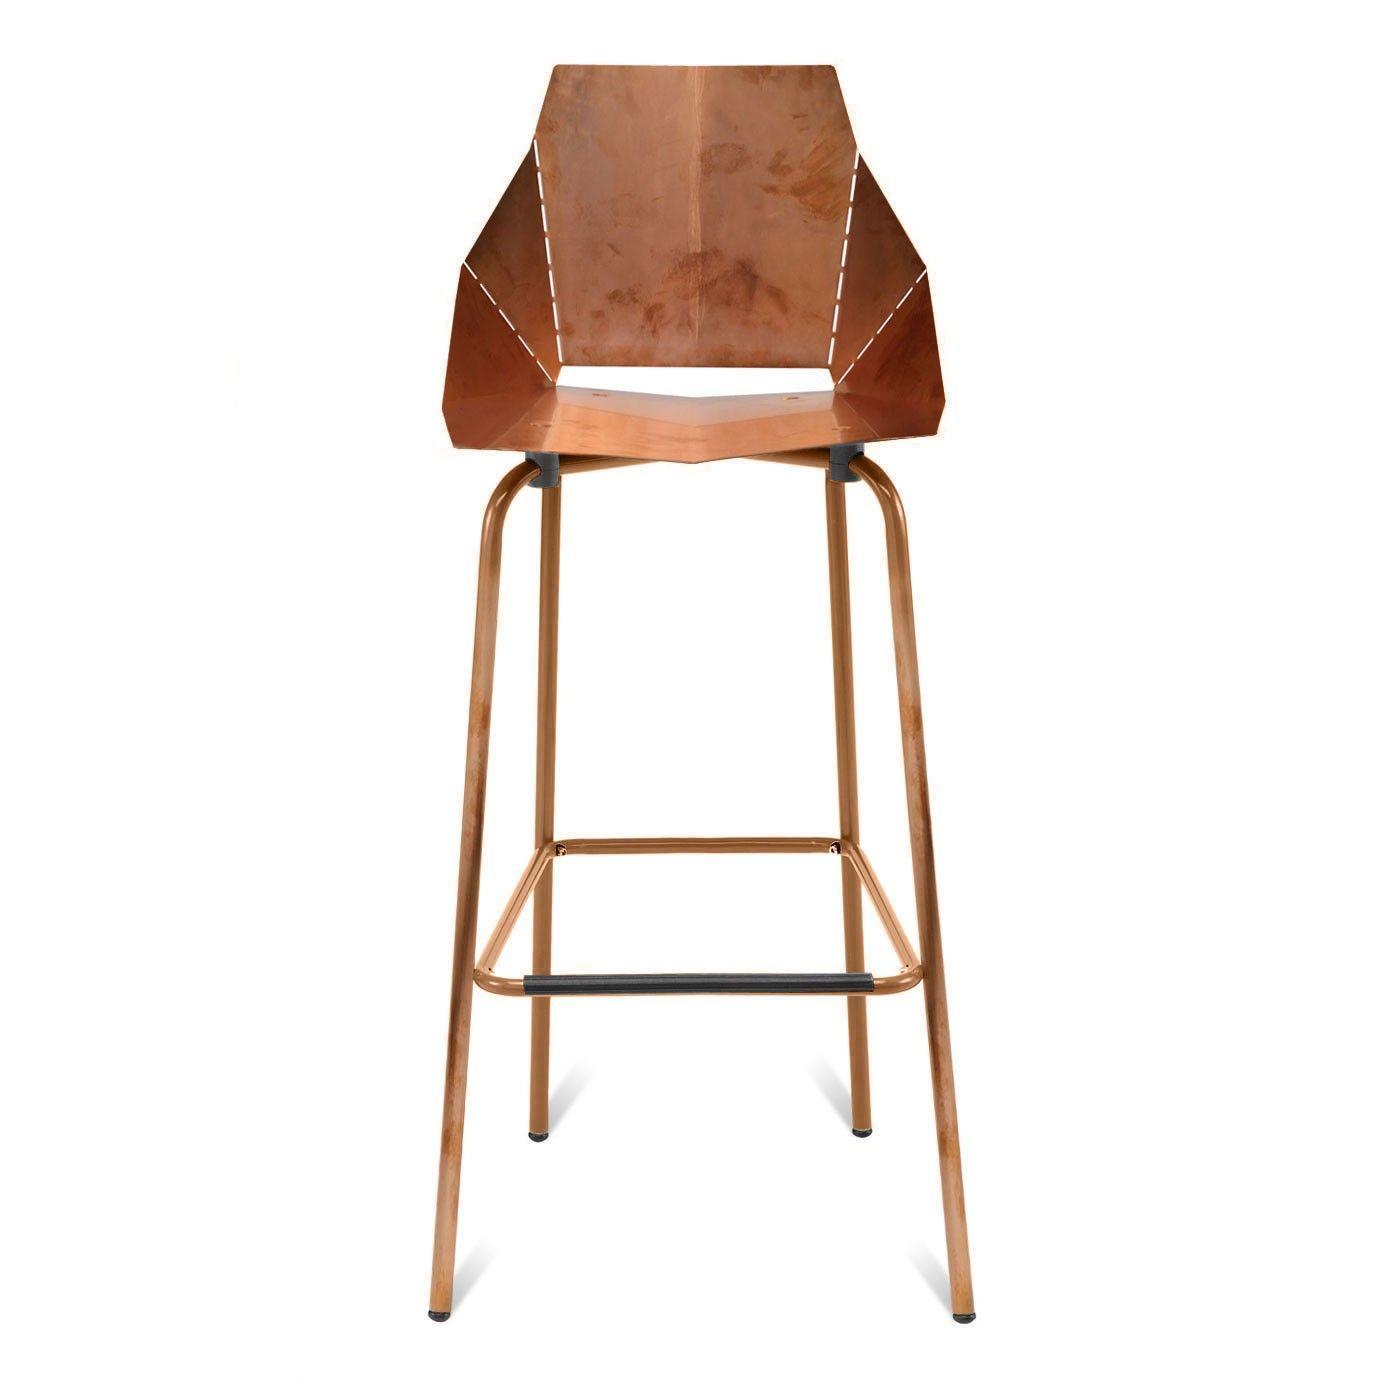 copper real good barstool  modern barstools  seating  blu dot  - copper real good barstool  modern barstools  seating  blu dot